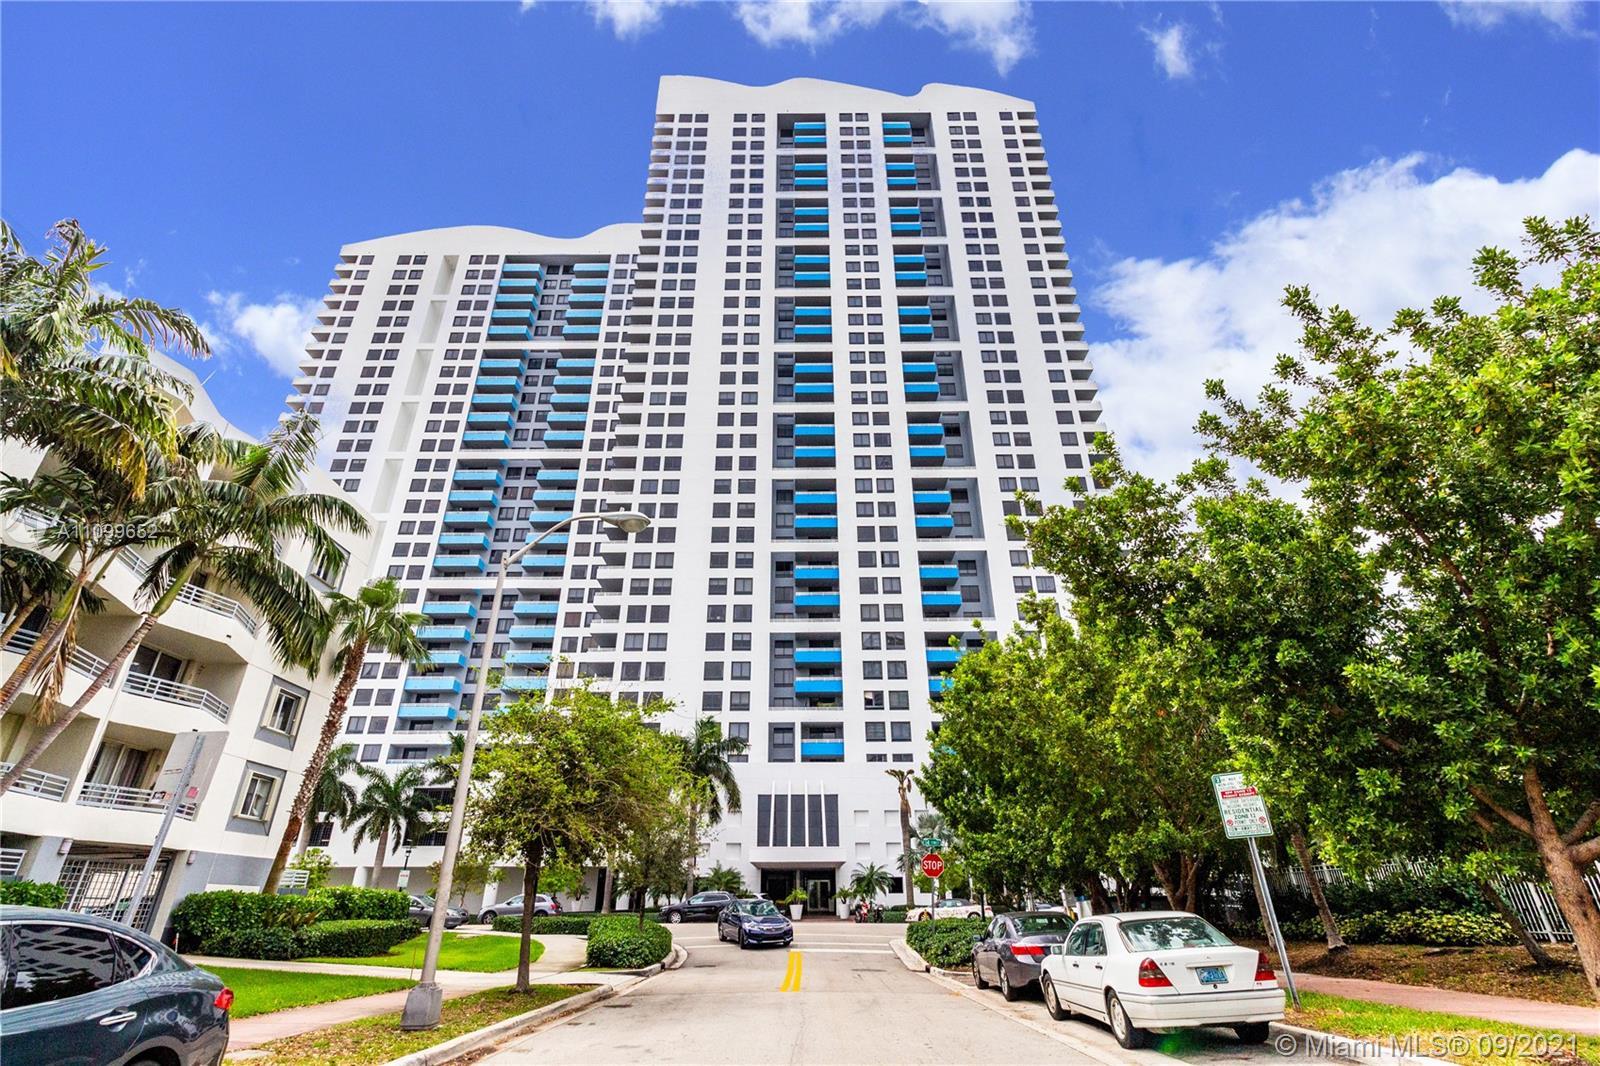 Waverly South Beach #2601 - 1330 West Ave #2601, Miami Beach, FL 33139